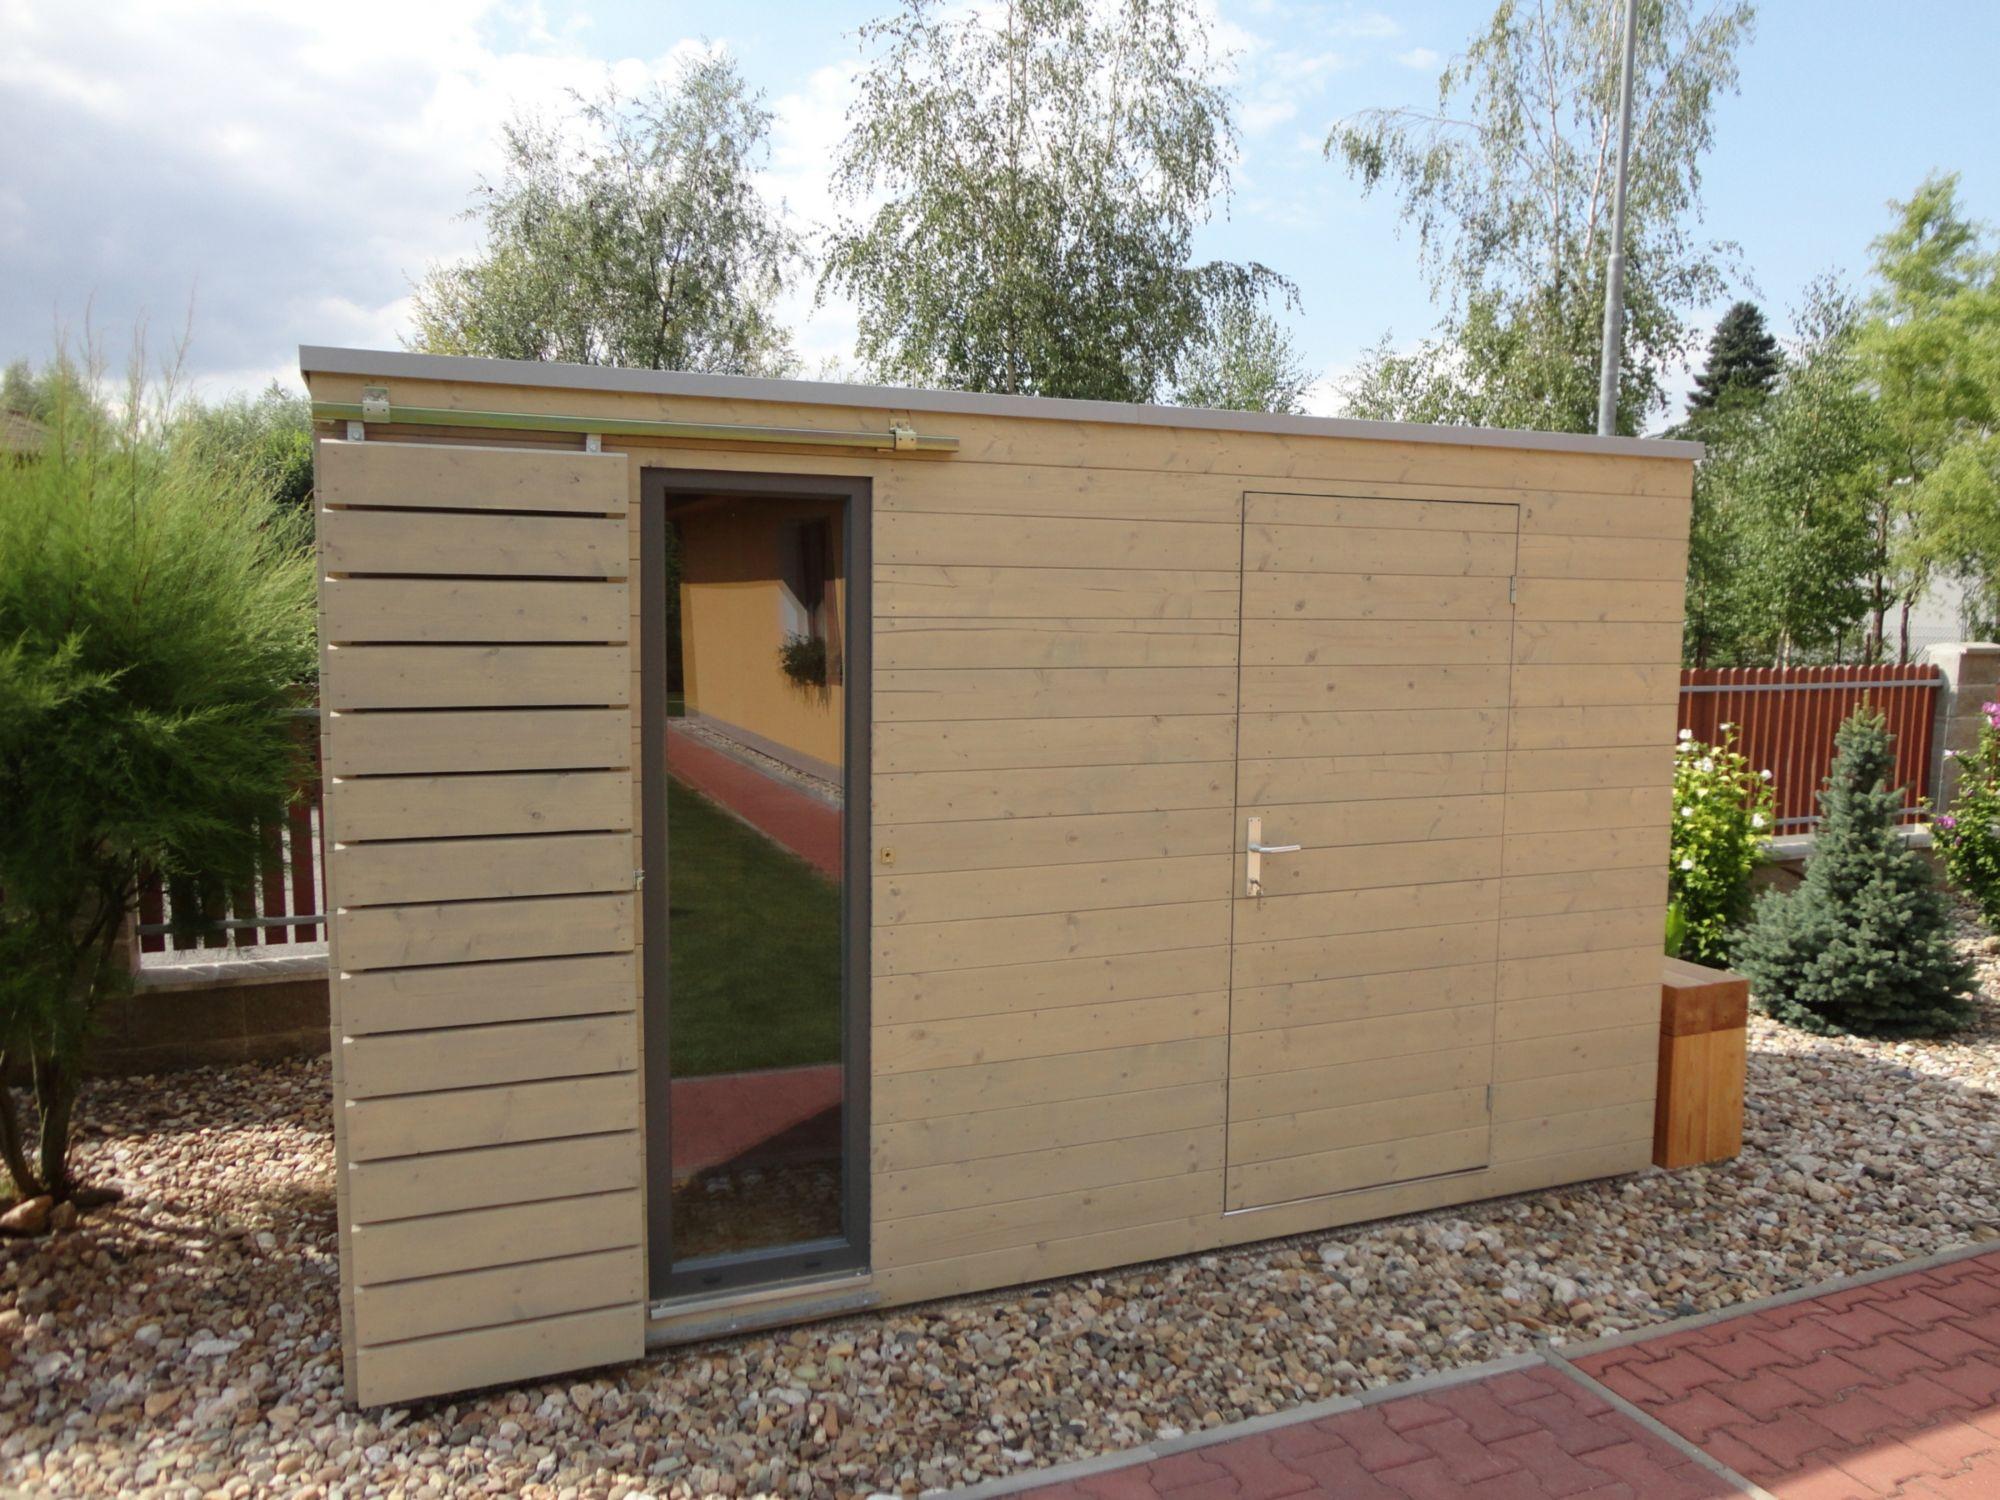 Gartenhaus 4x2 m naturhouse s7 naturhouse moderne for Modernes haus mit holzfenster